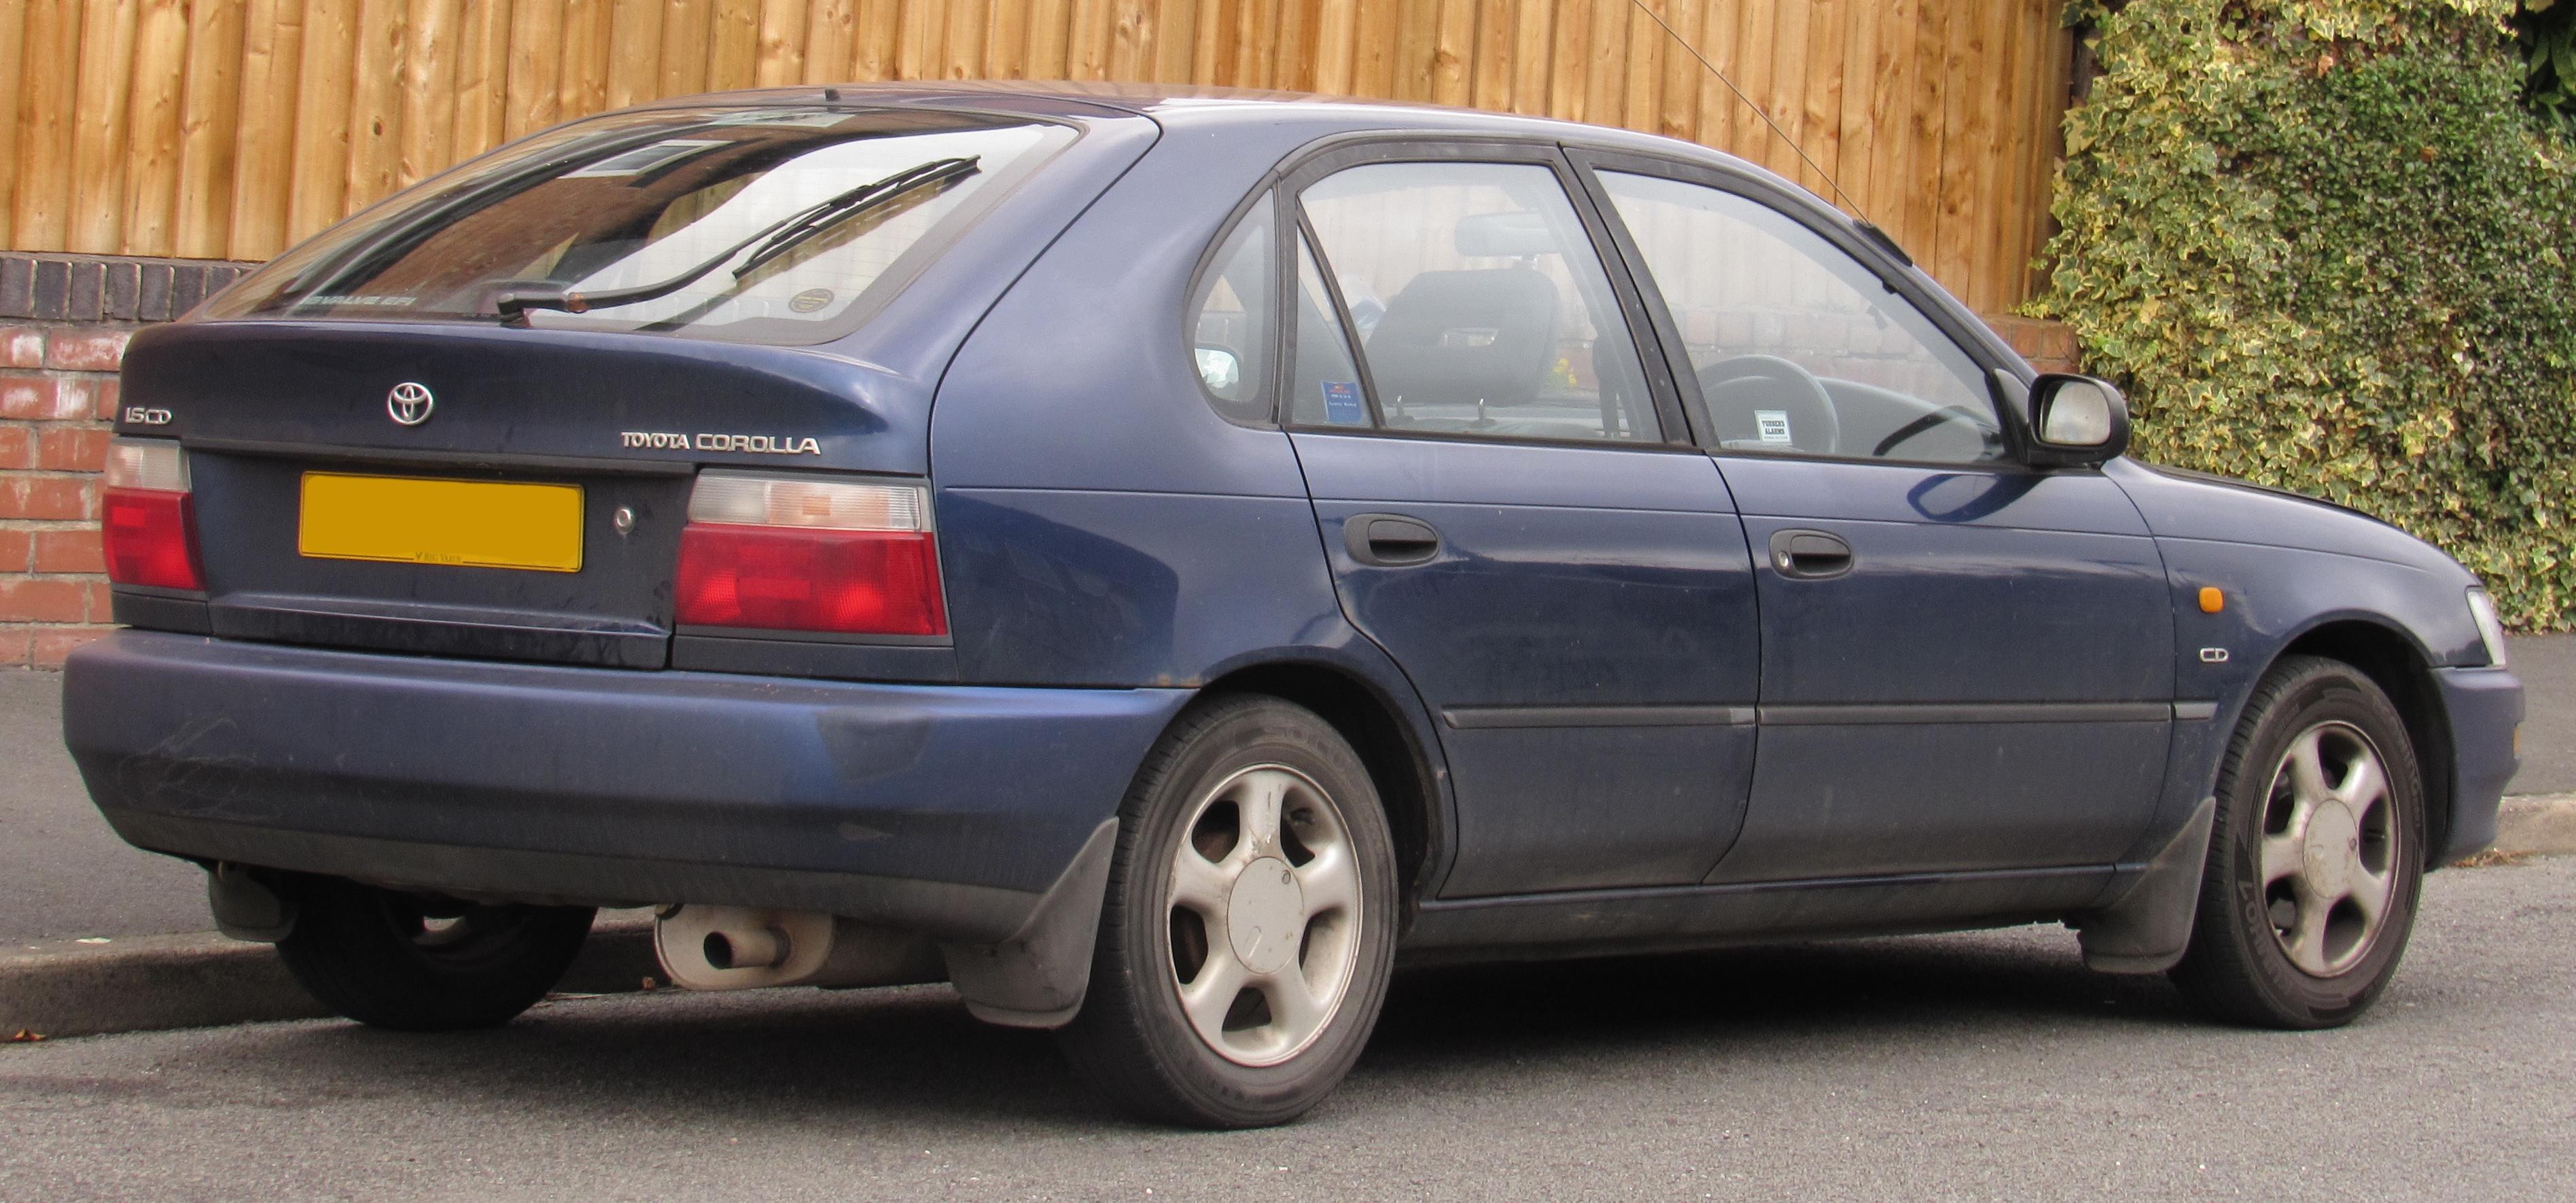 Kelebihan Kekurangan Toyota Corolla 1996 Review